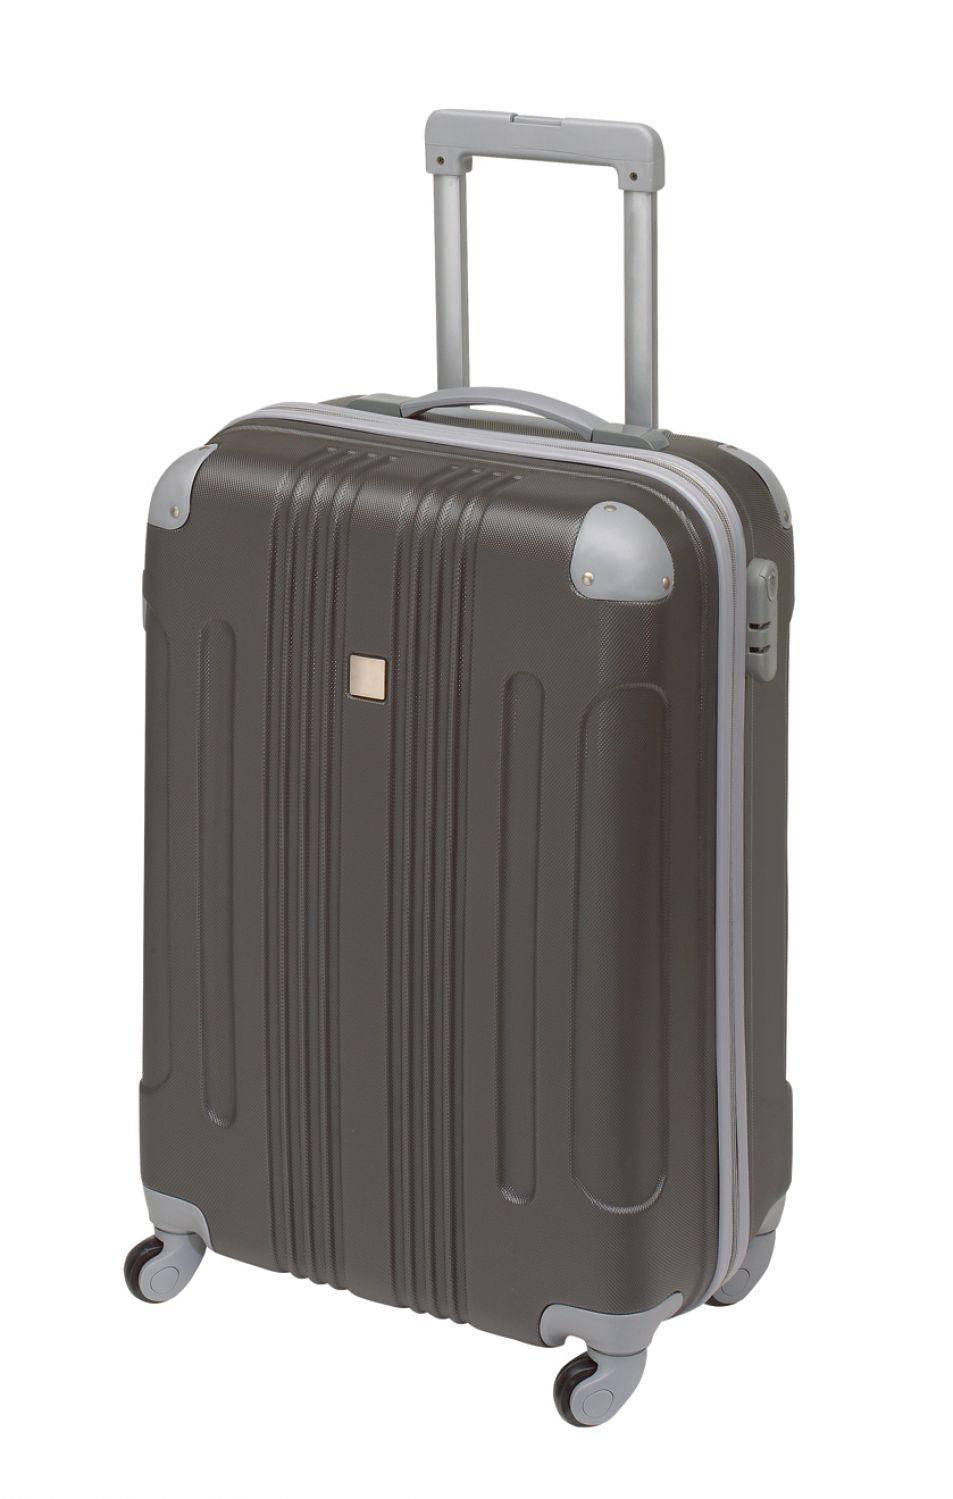 handgep ck 55cm bordcase rom trolley 29l bordgep ck 2 9kg. Black Bedroom Furniture Sets. Home Design Ideas